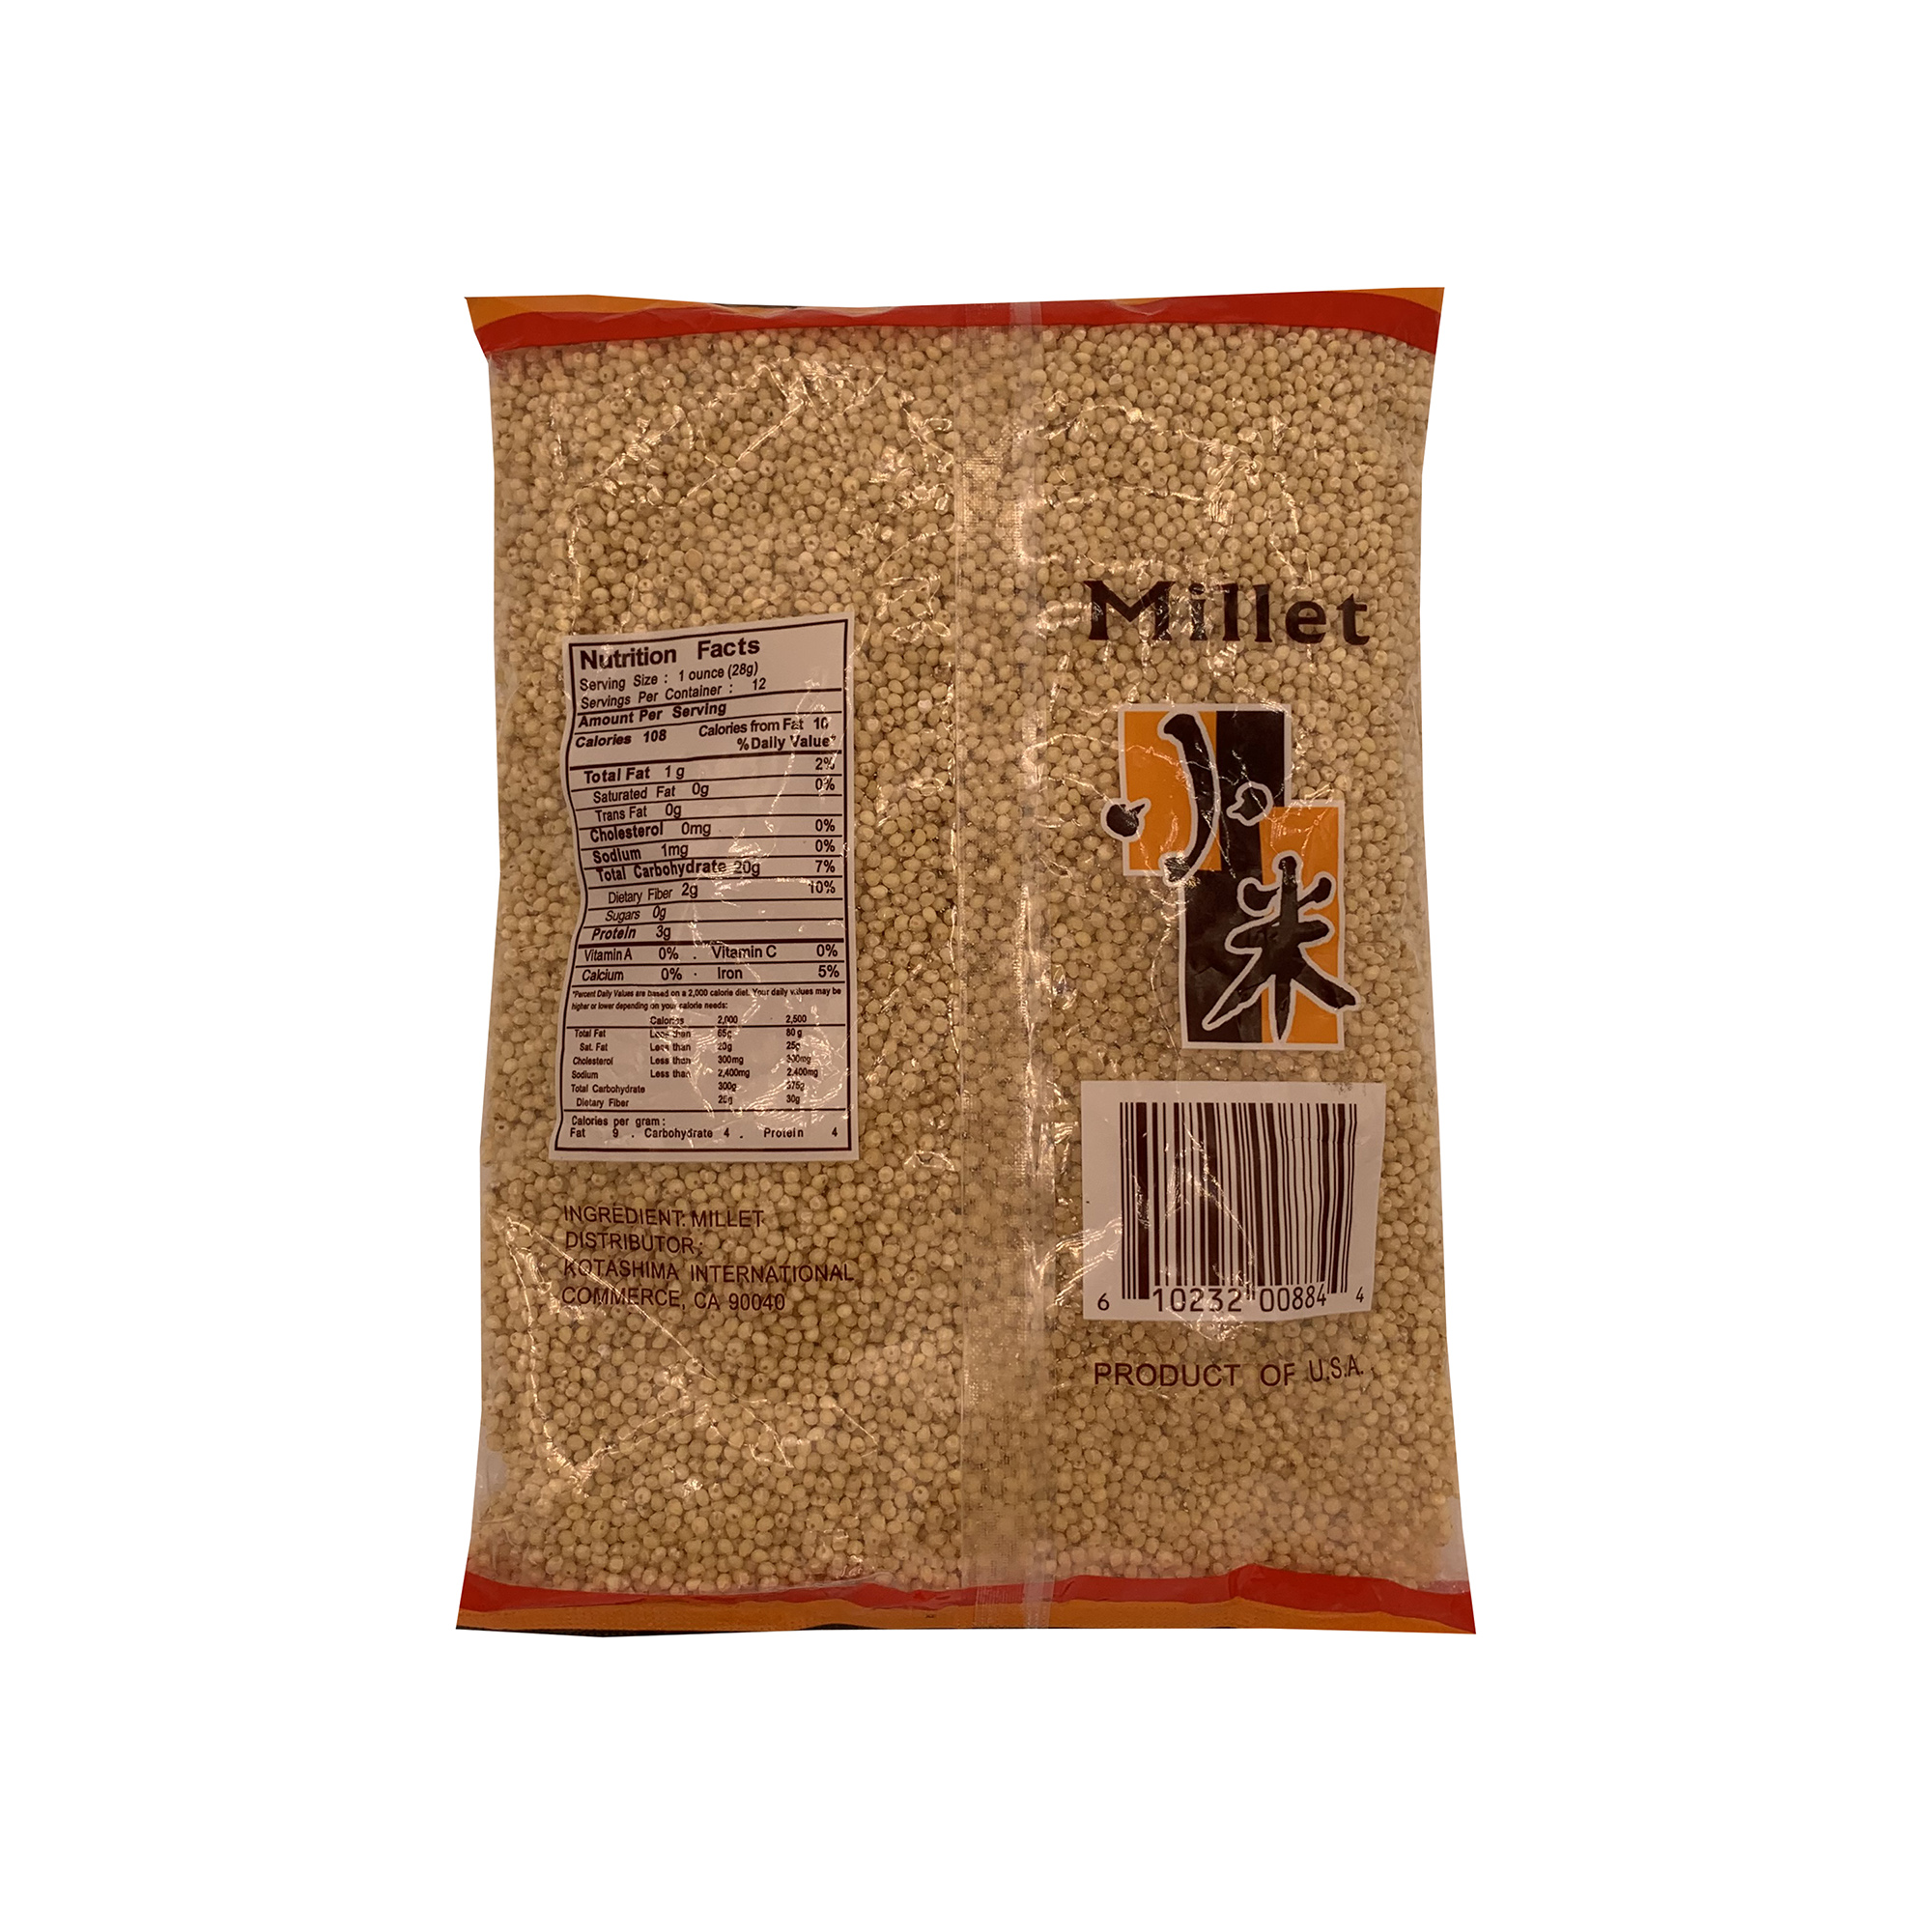 medium kotashima millet 12 oz sqrz 53BhS